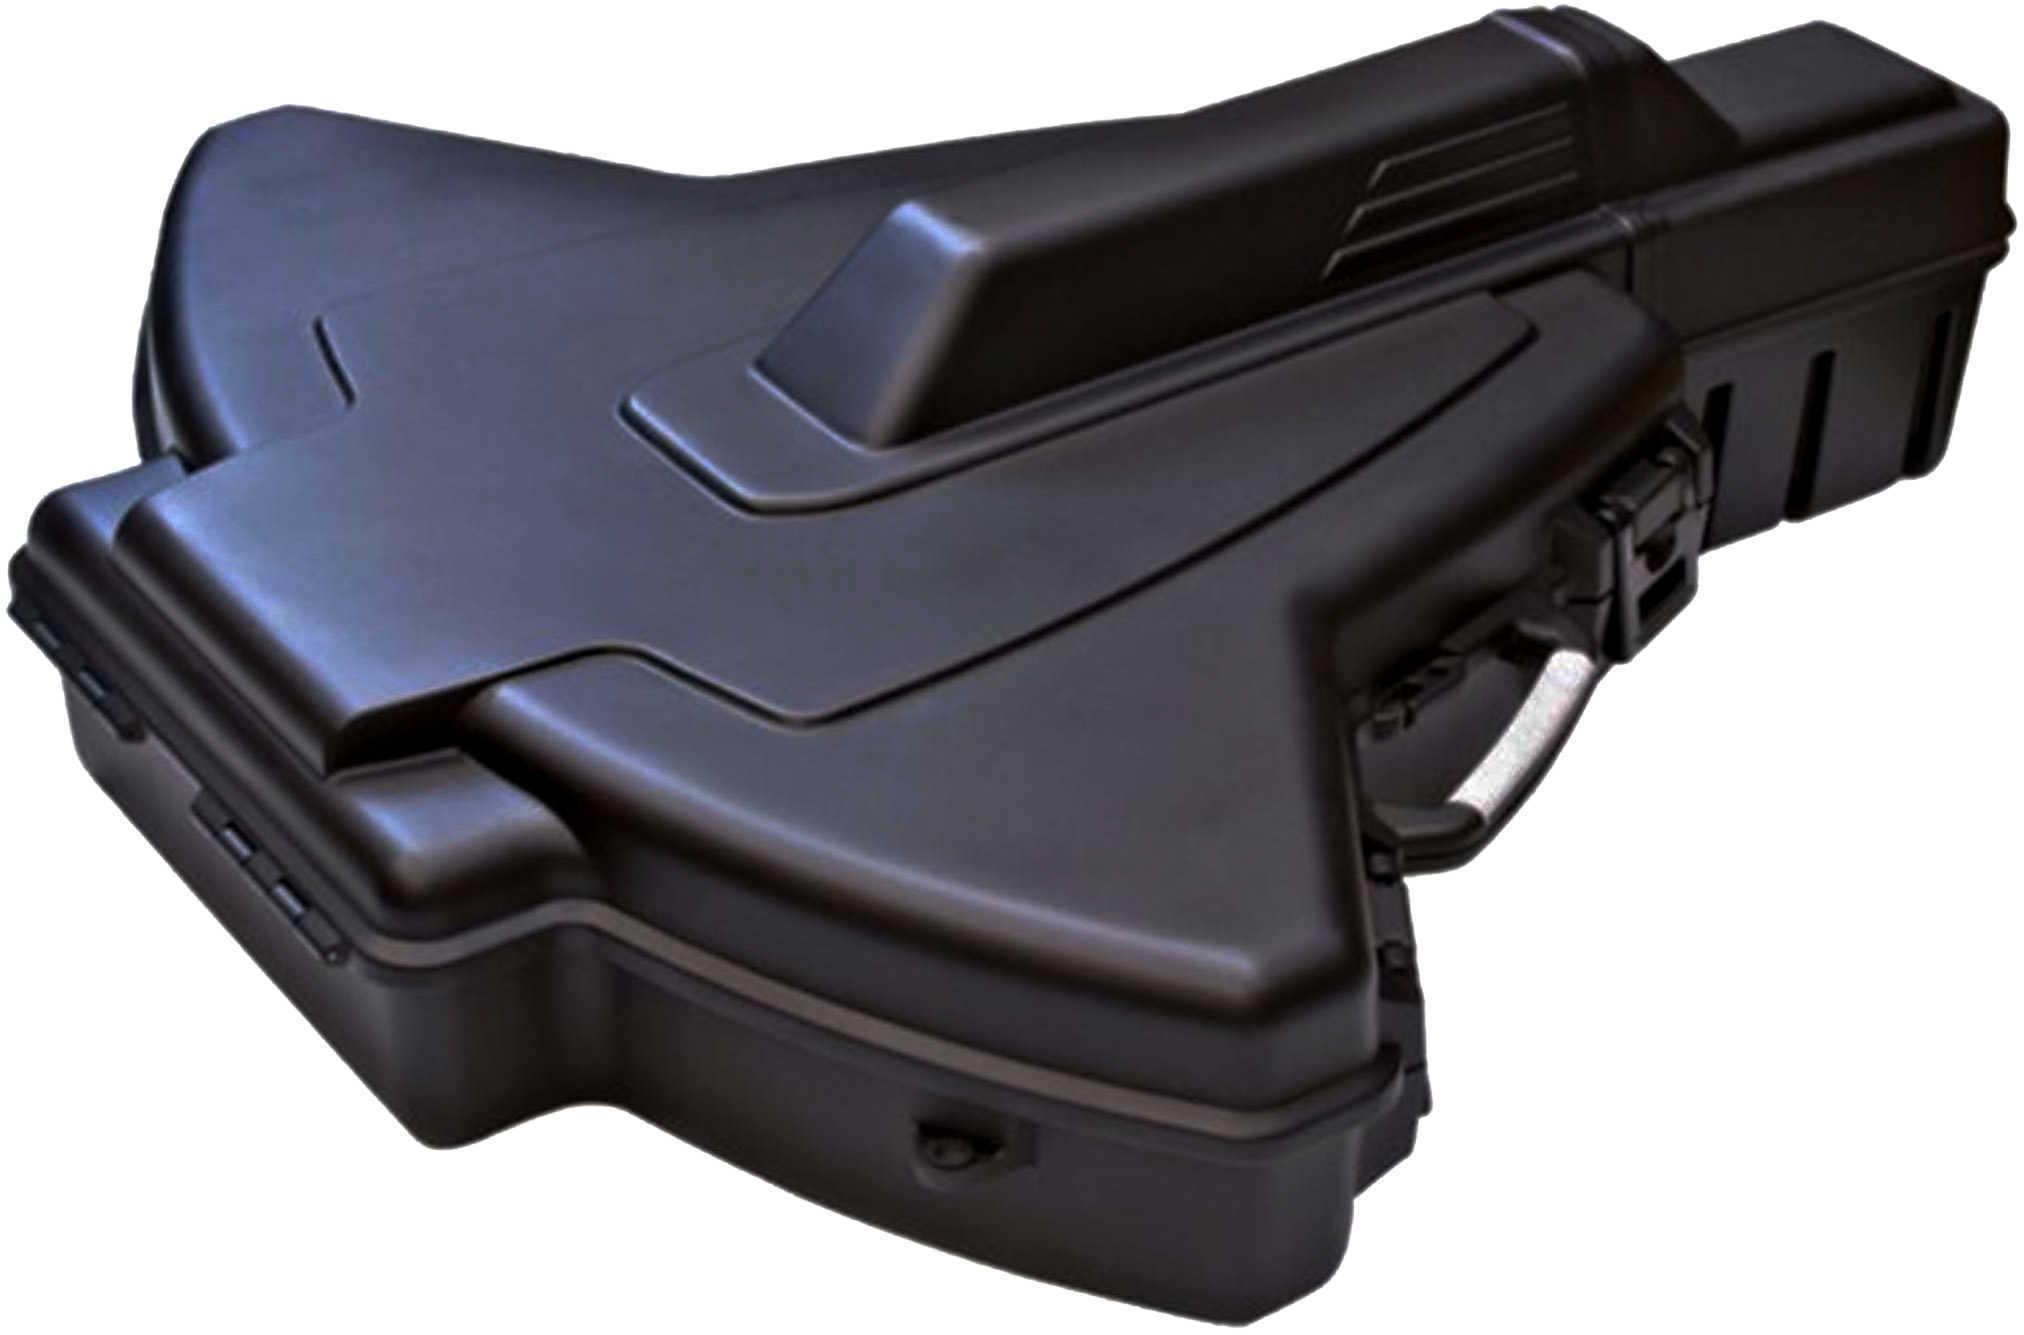 Plano Crossbow Case Manta Black Adjustable Single Bow